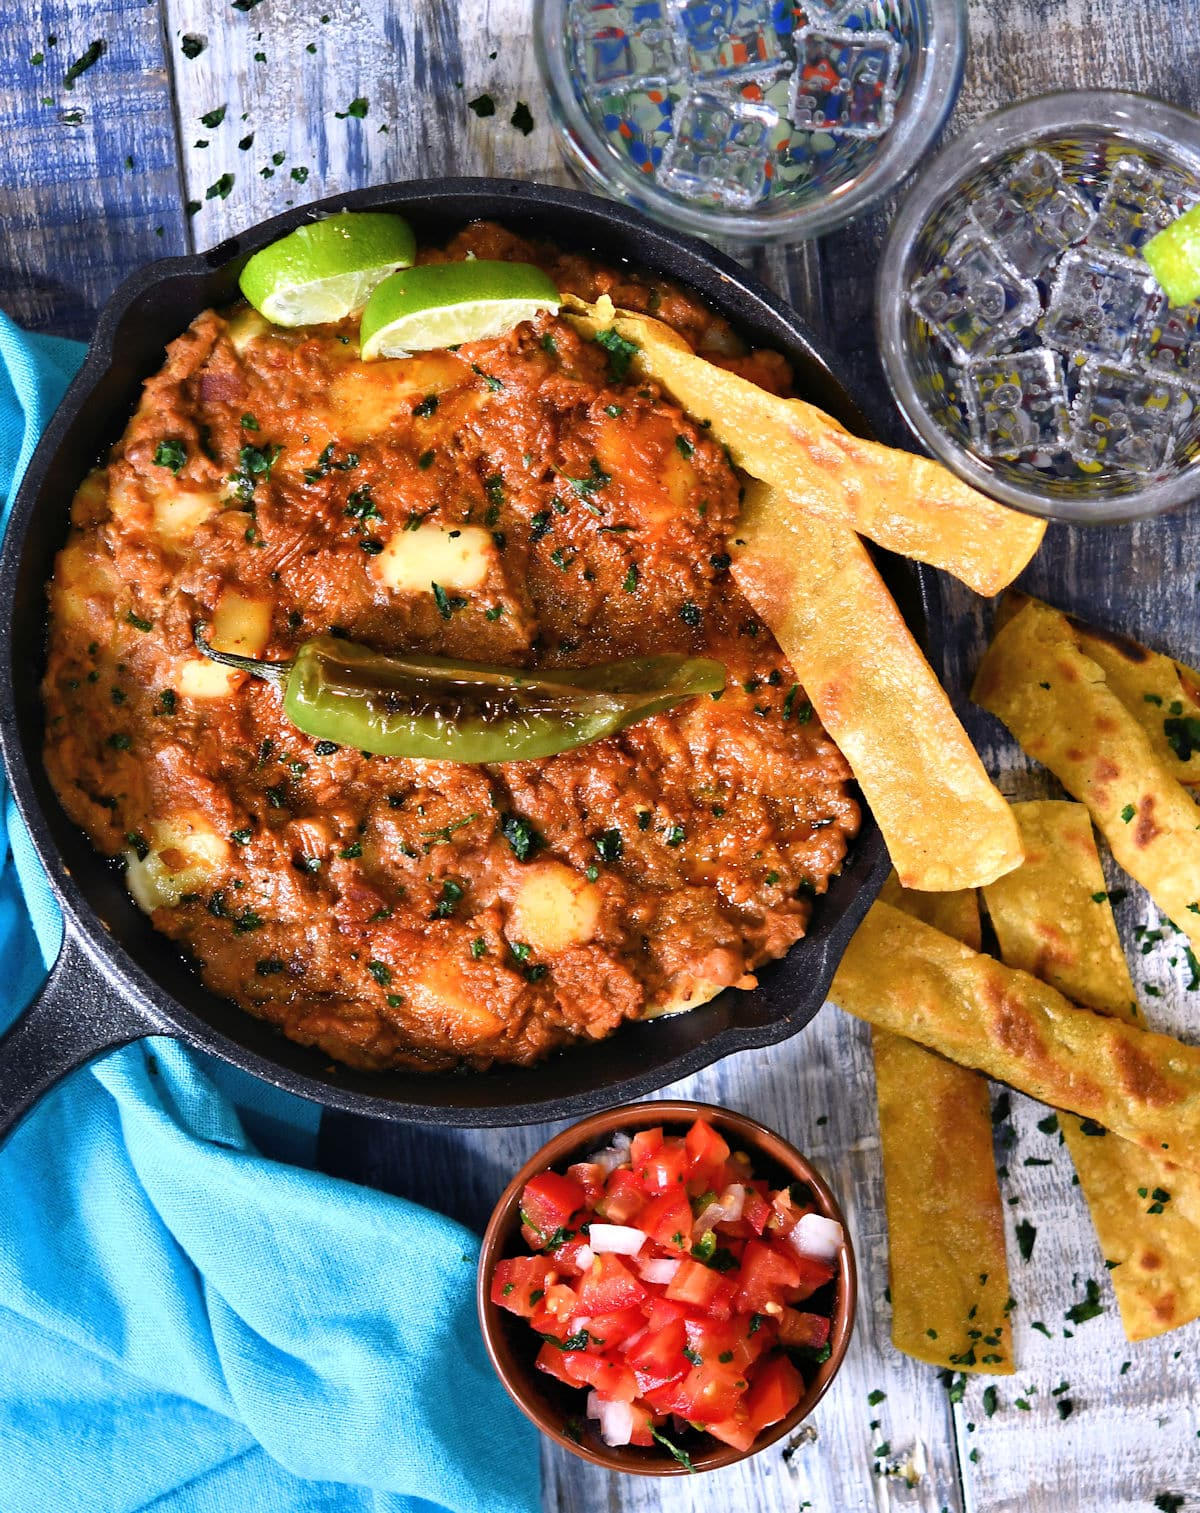 24Bite: Frijoles Puercos Sinaloa Refried Beans Recipe by Christian Guzman